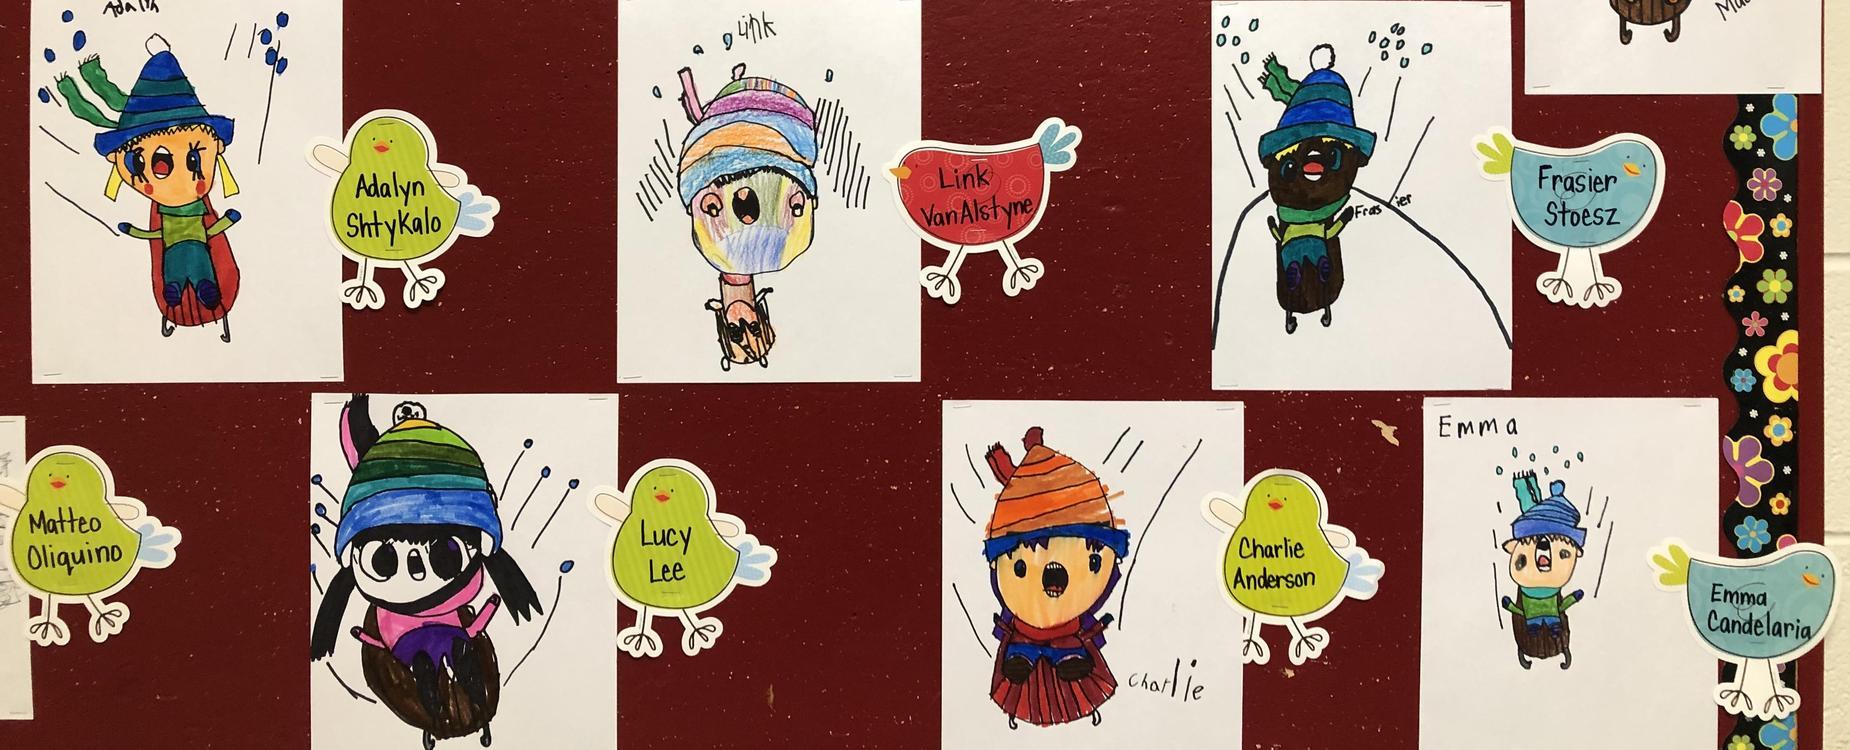 Grade 1 students have drawn cartoon characters tobogganing down a hill.